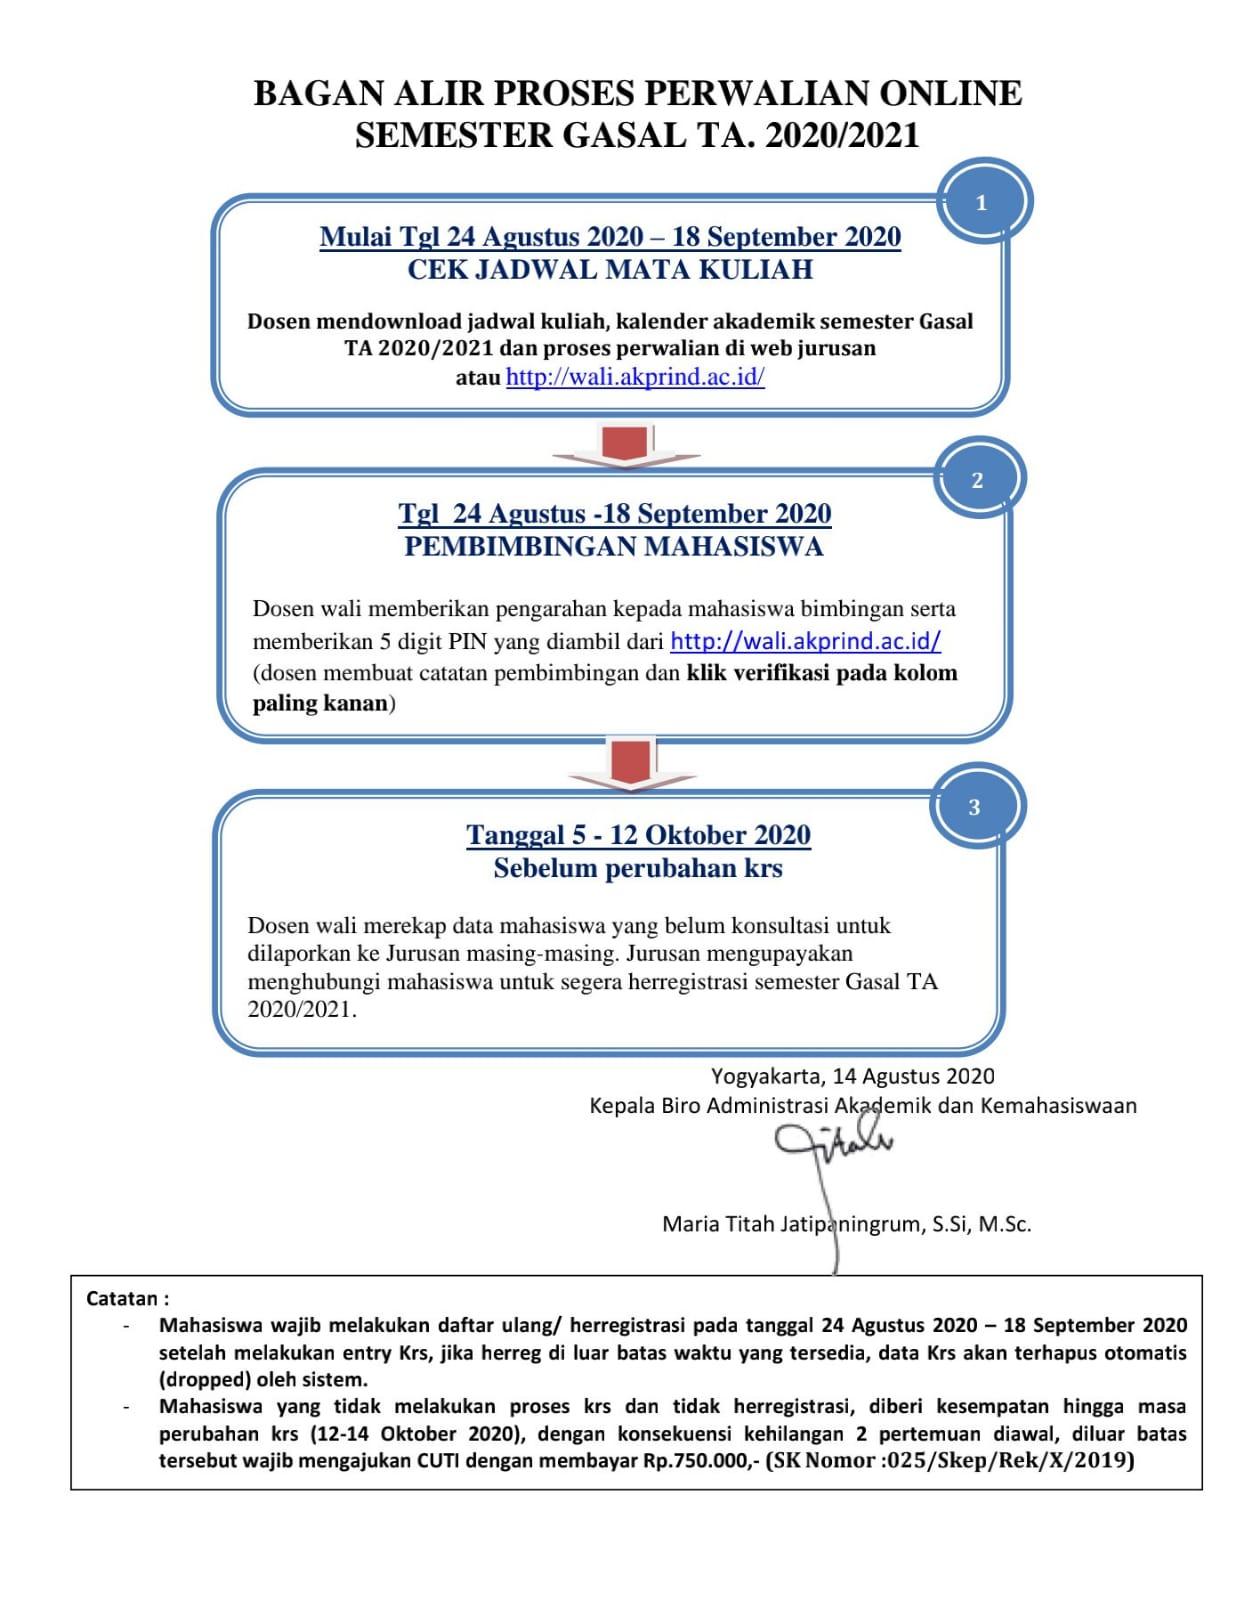 Bagan Alir Proses Perwalian Online Semester Gasal TA 2020/2021